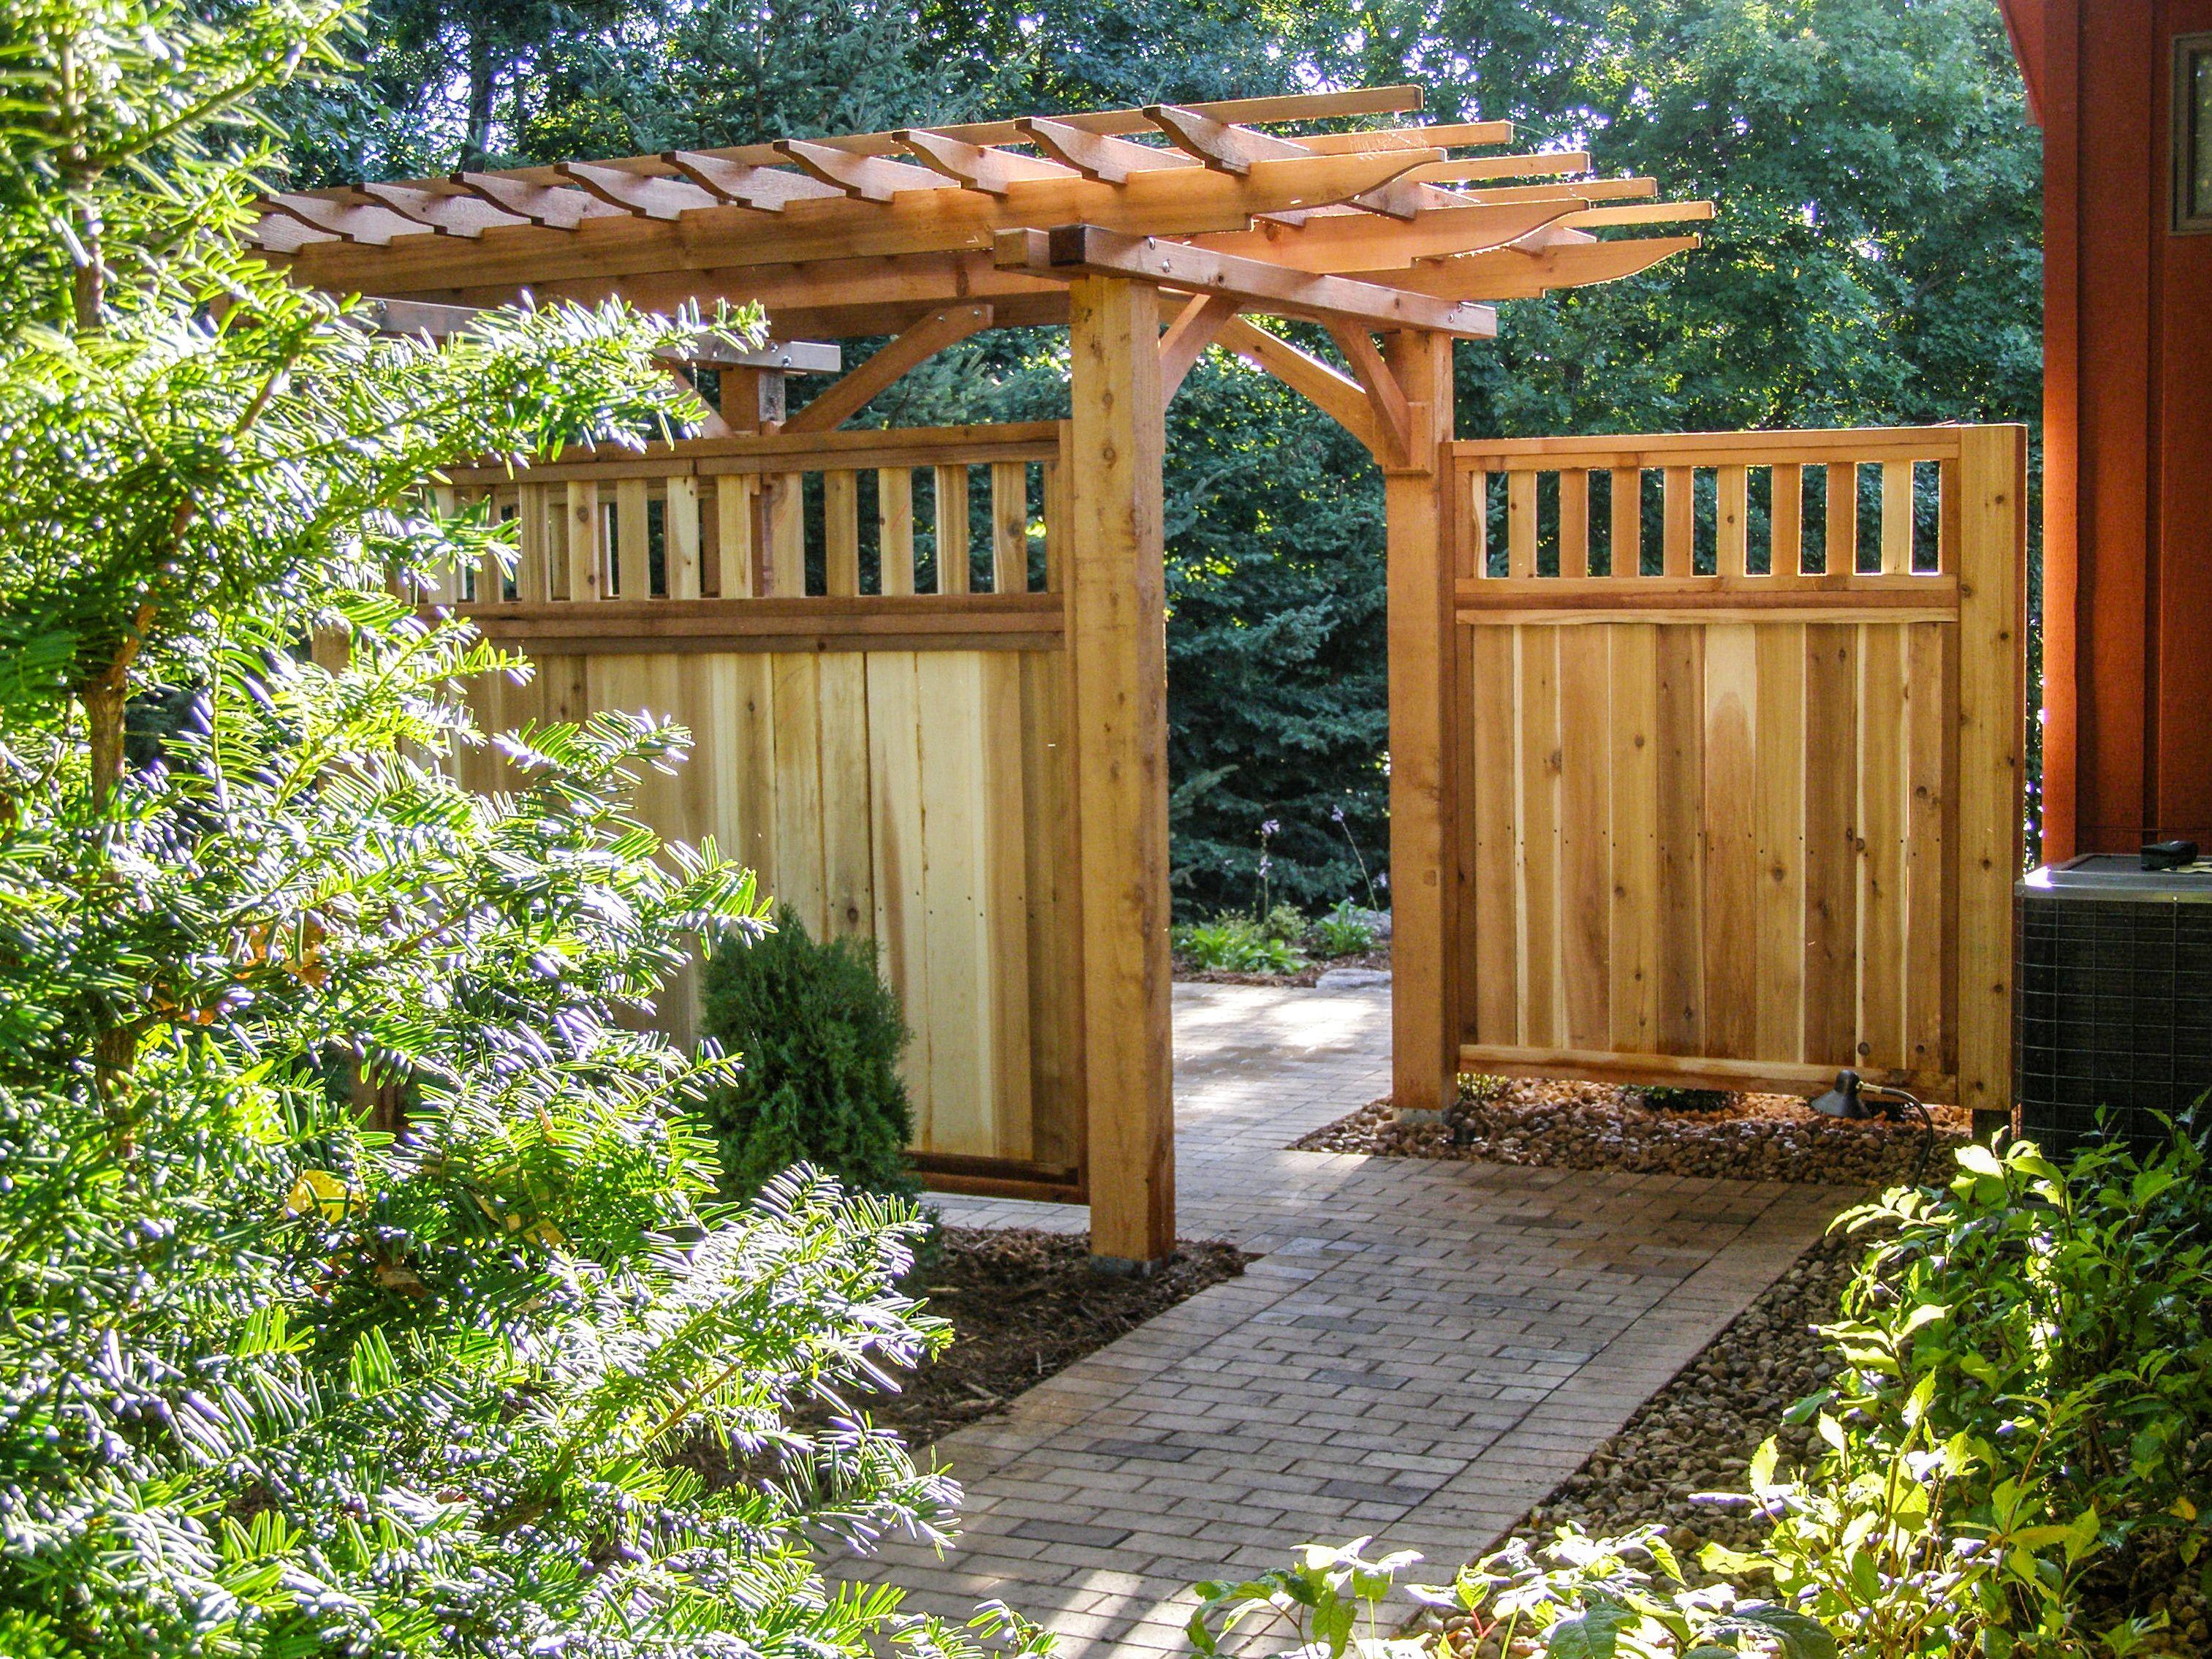 Your Perfect Backyard Includes Brick Paver Paths Landscape Design Diy Pergola Pergola